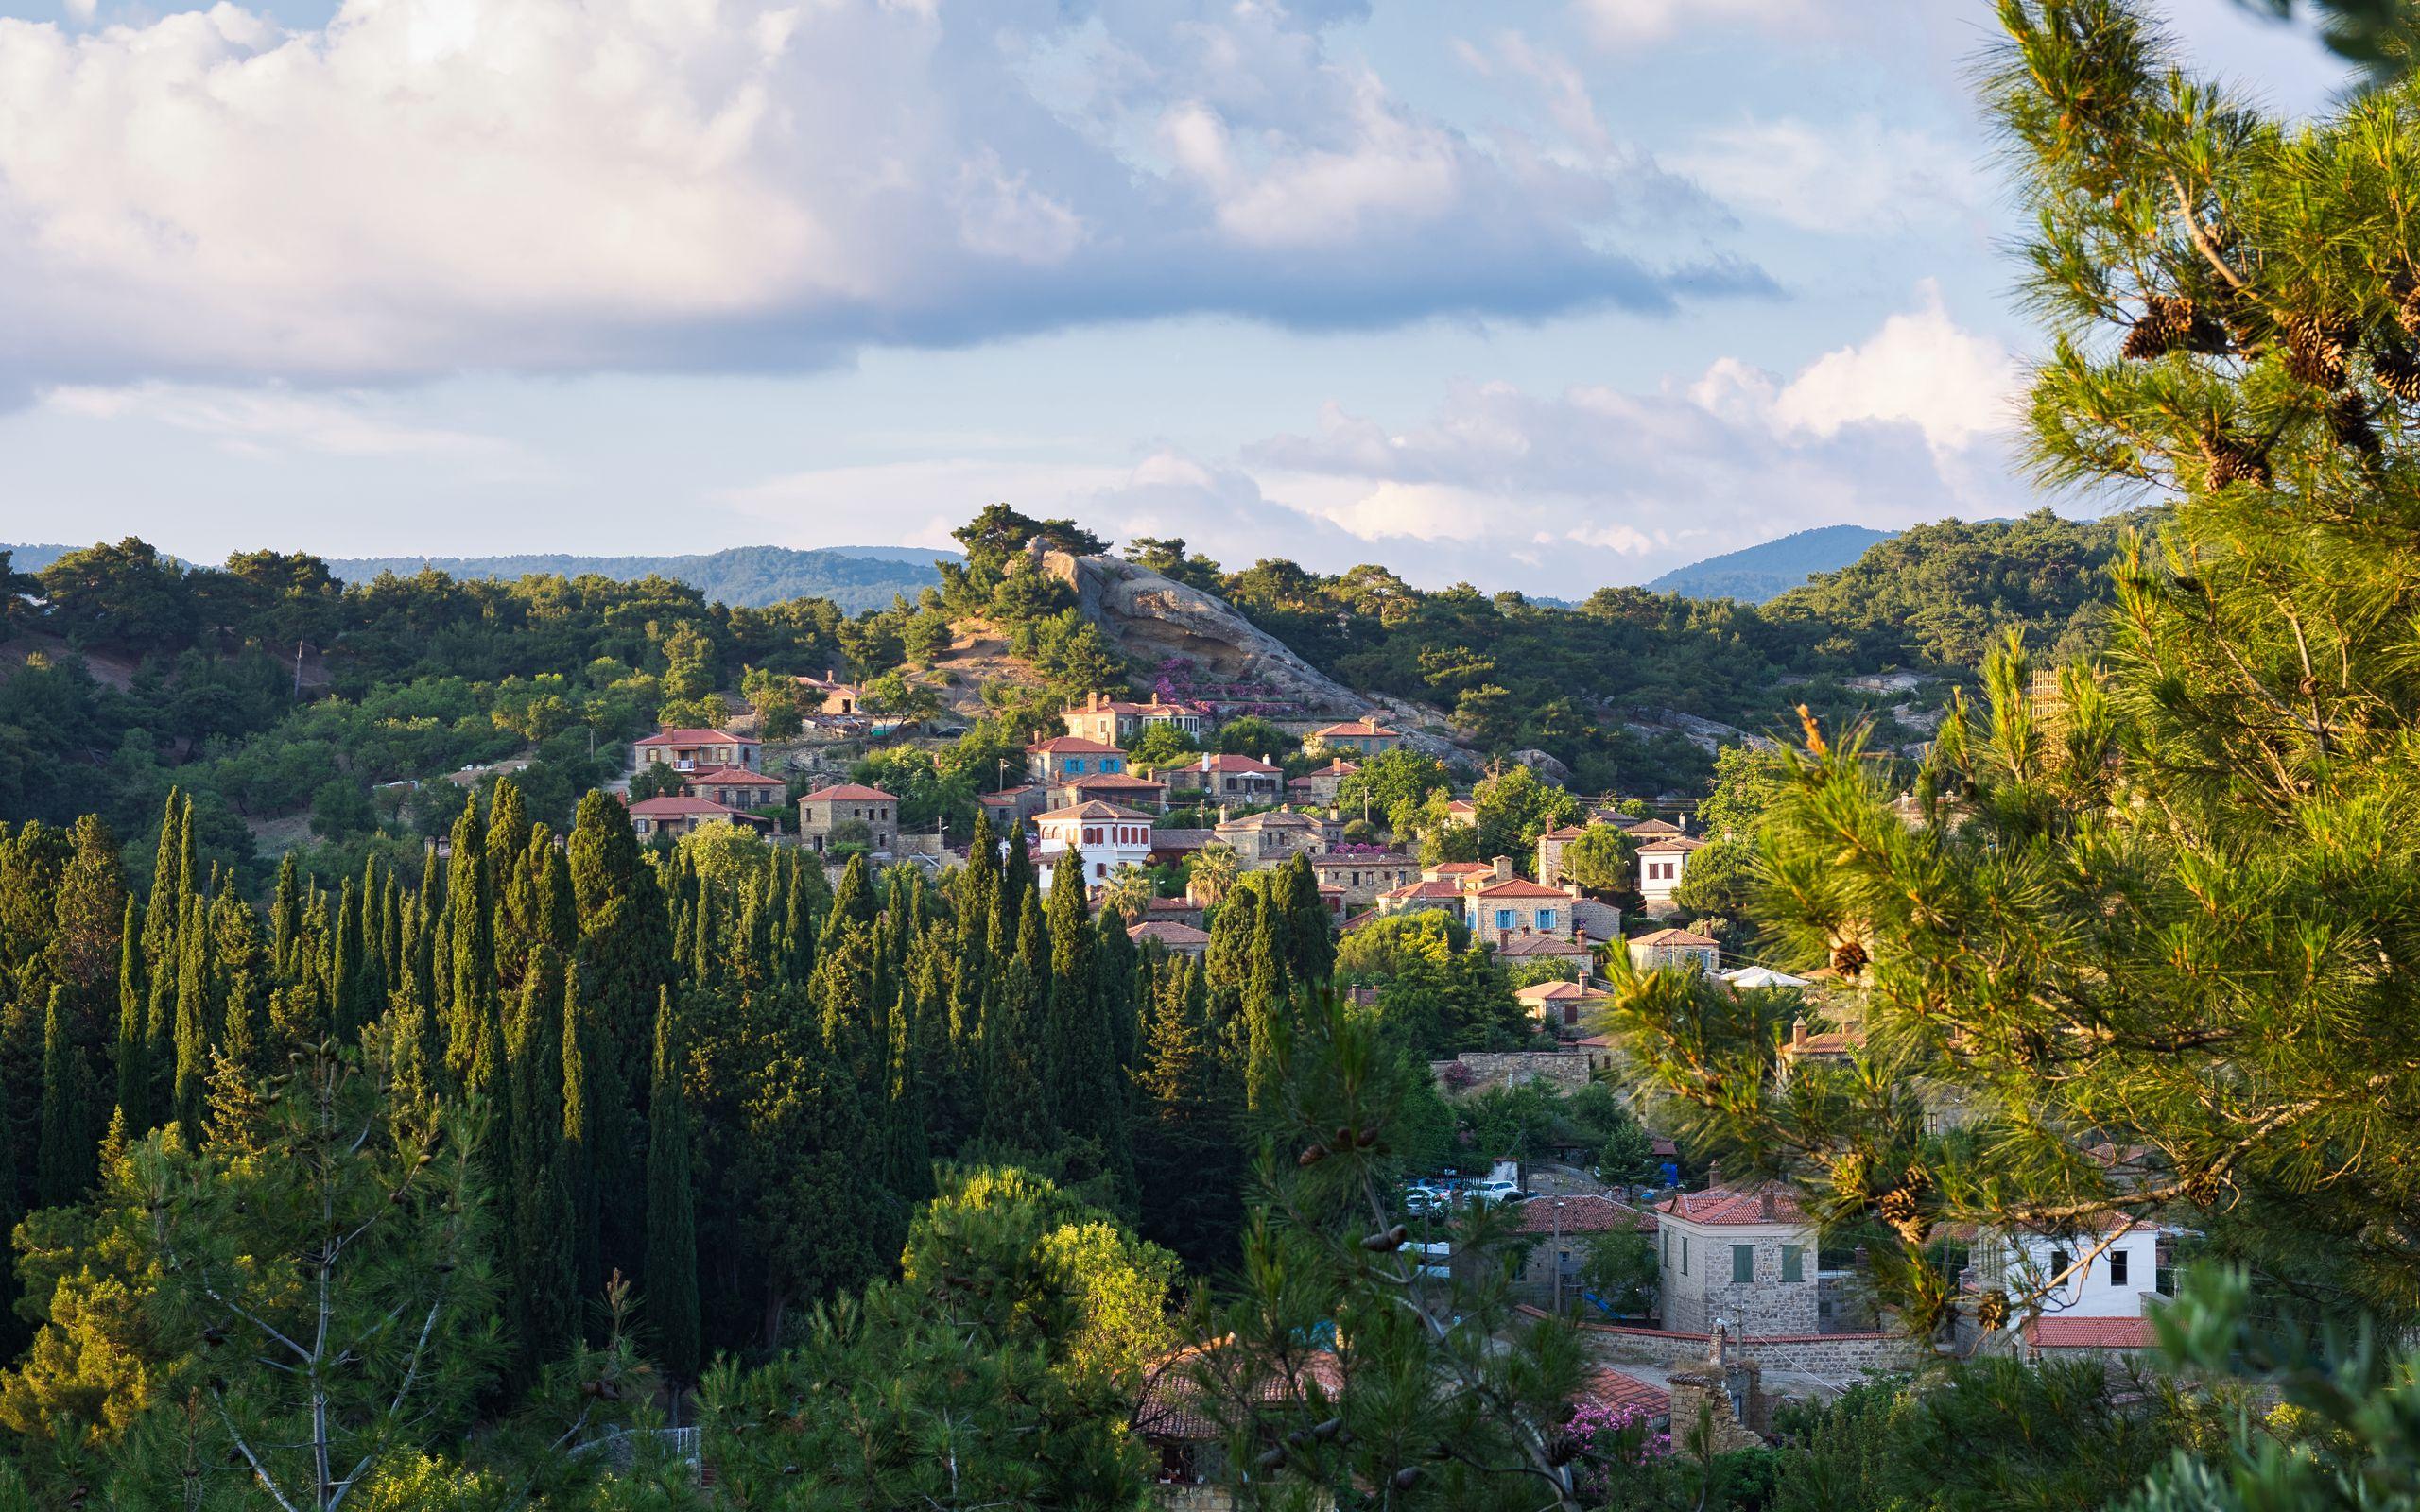 2560x1600 Wallpaper village, mountain, buildings, trees